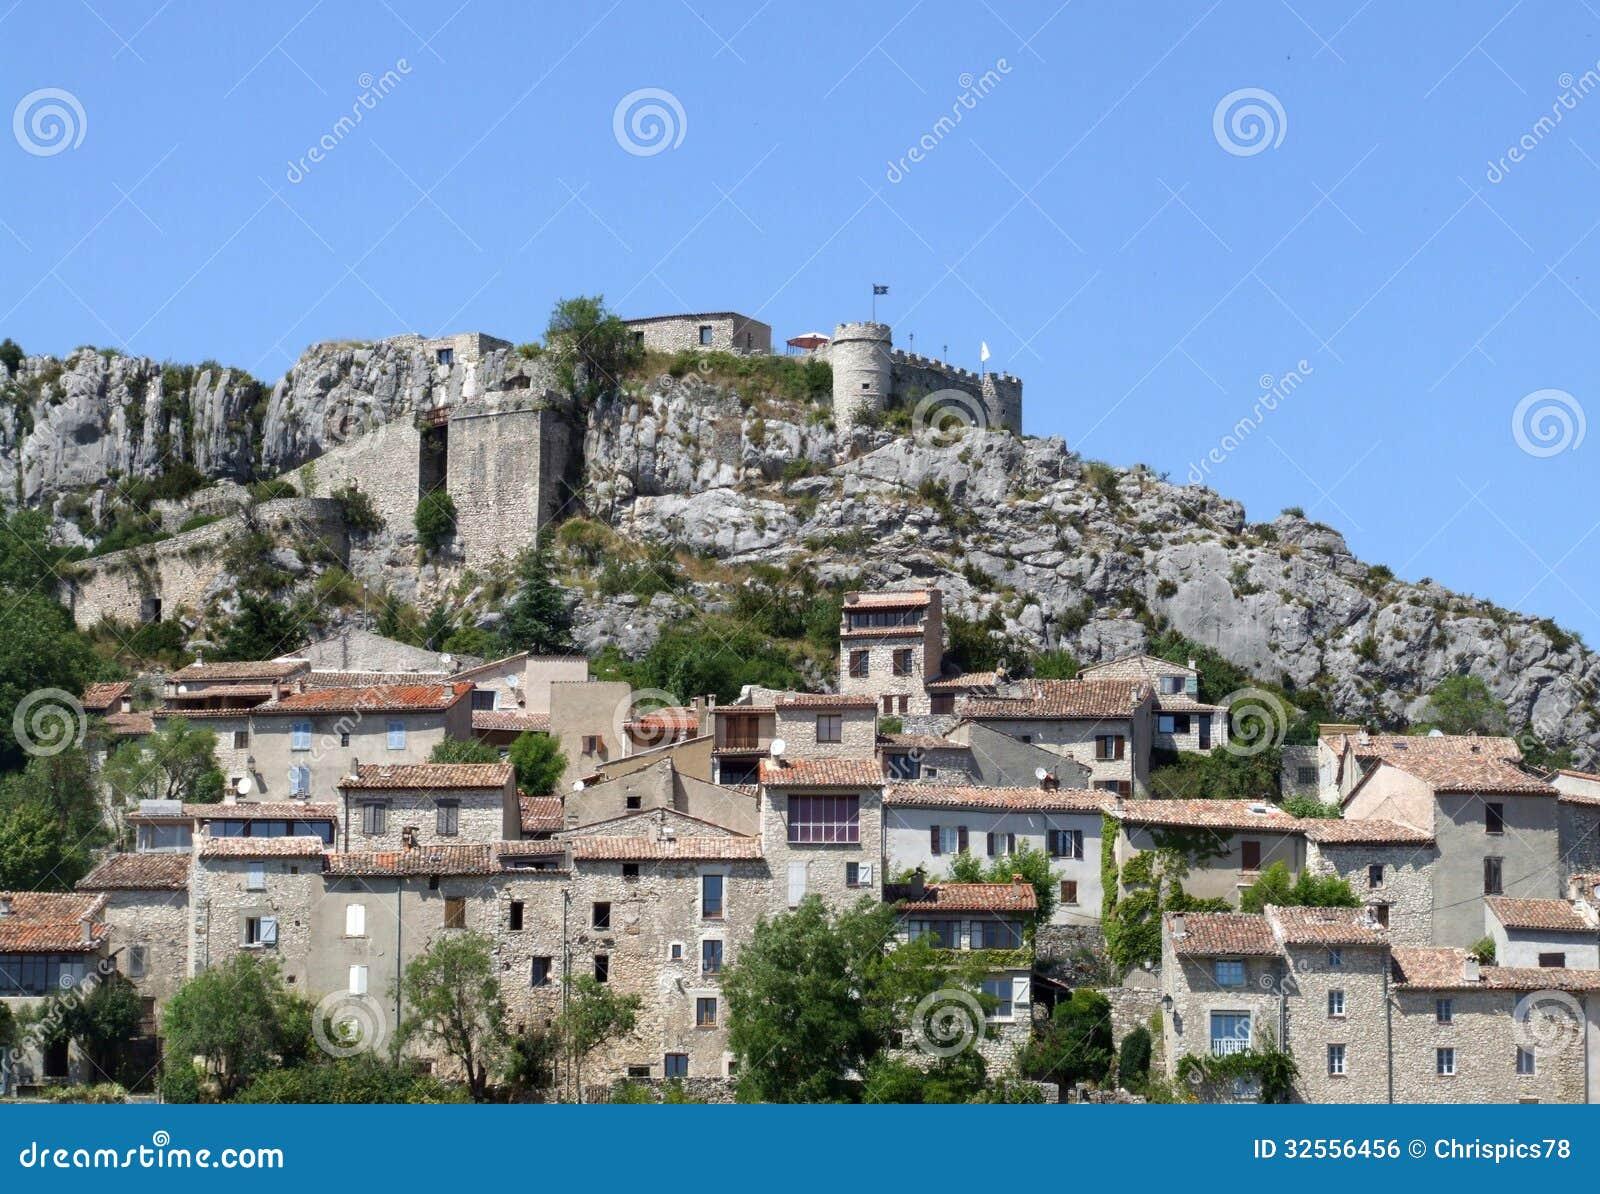 medieval village with castle royalty free stock image image 32556456. Black Bedroom Furniture Sets. Home Design Ideas